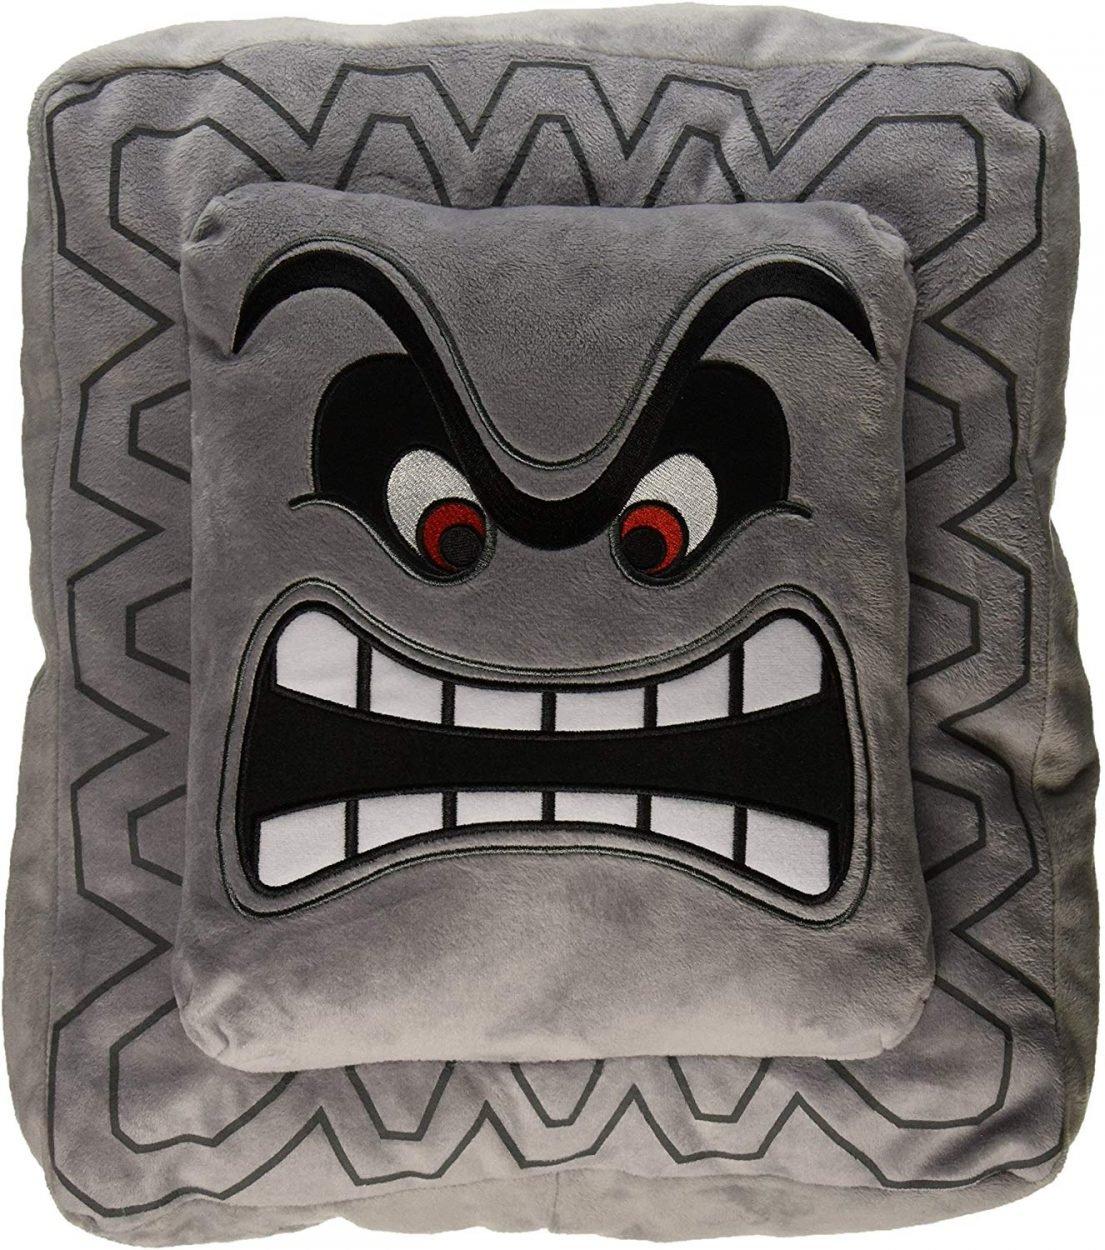 Mario Thwomp Pillow